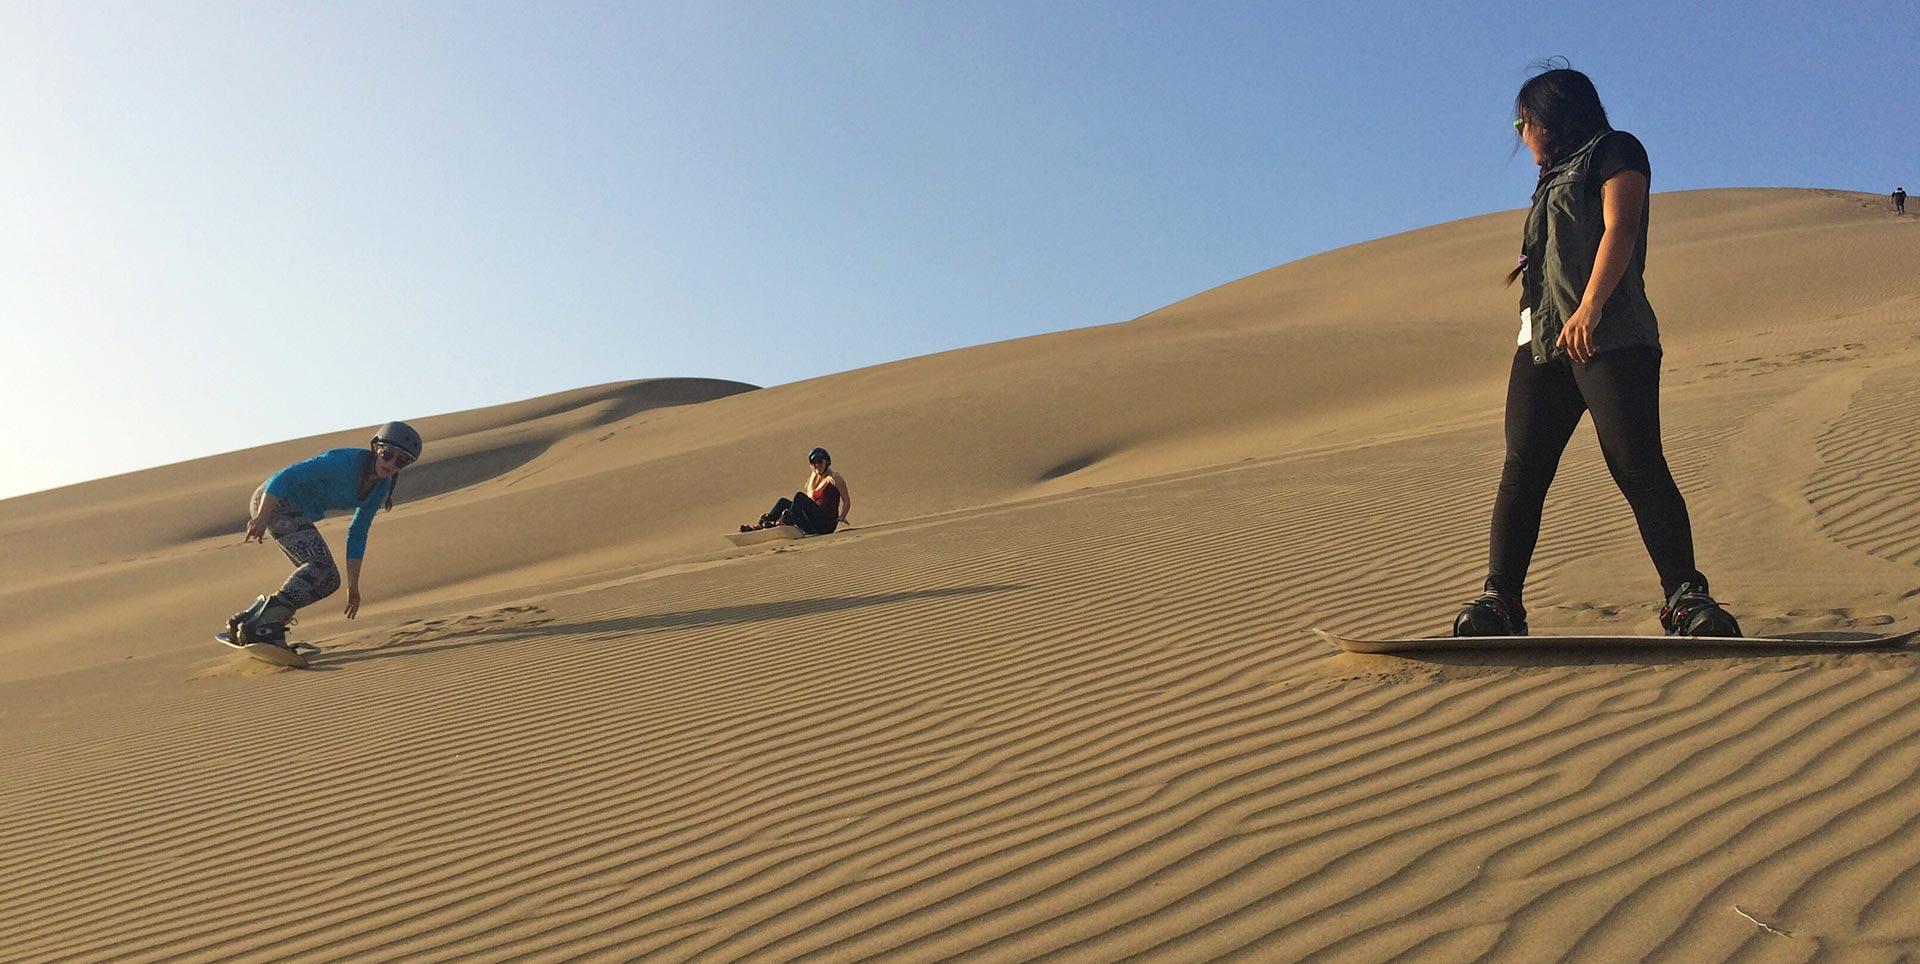 Sanboard-Lima-Perú-Ica-Paracas-Nazca